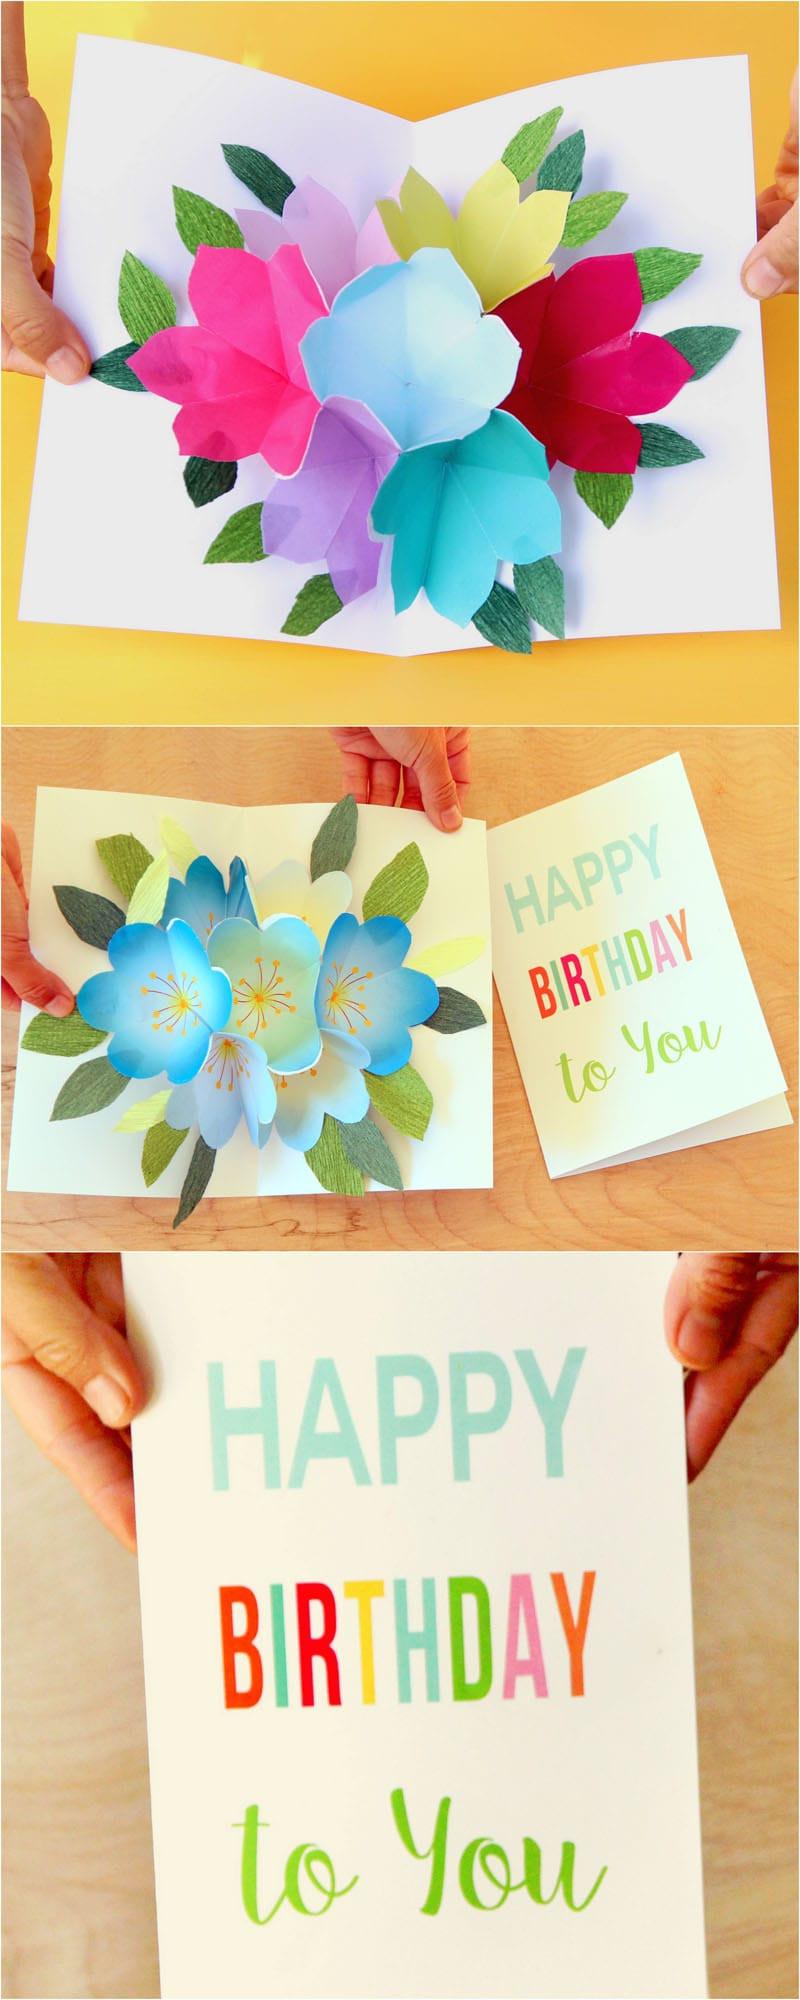 Happy Birthday Card Diy  Free Printable Happy Birthday Card with Pop Up Bouquet A